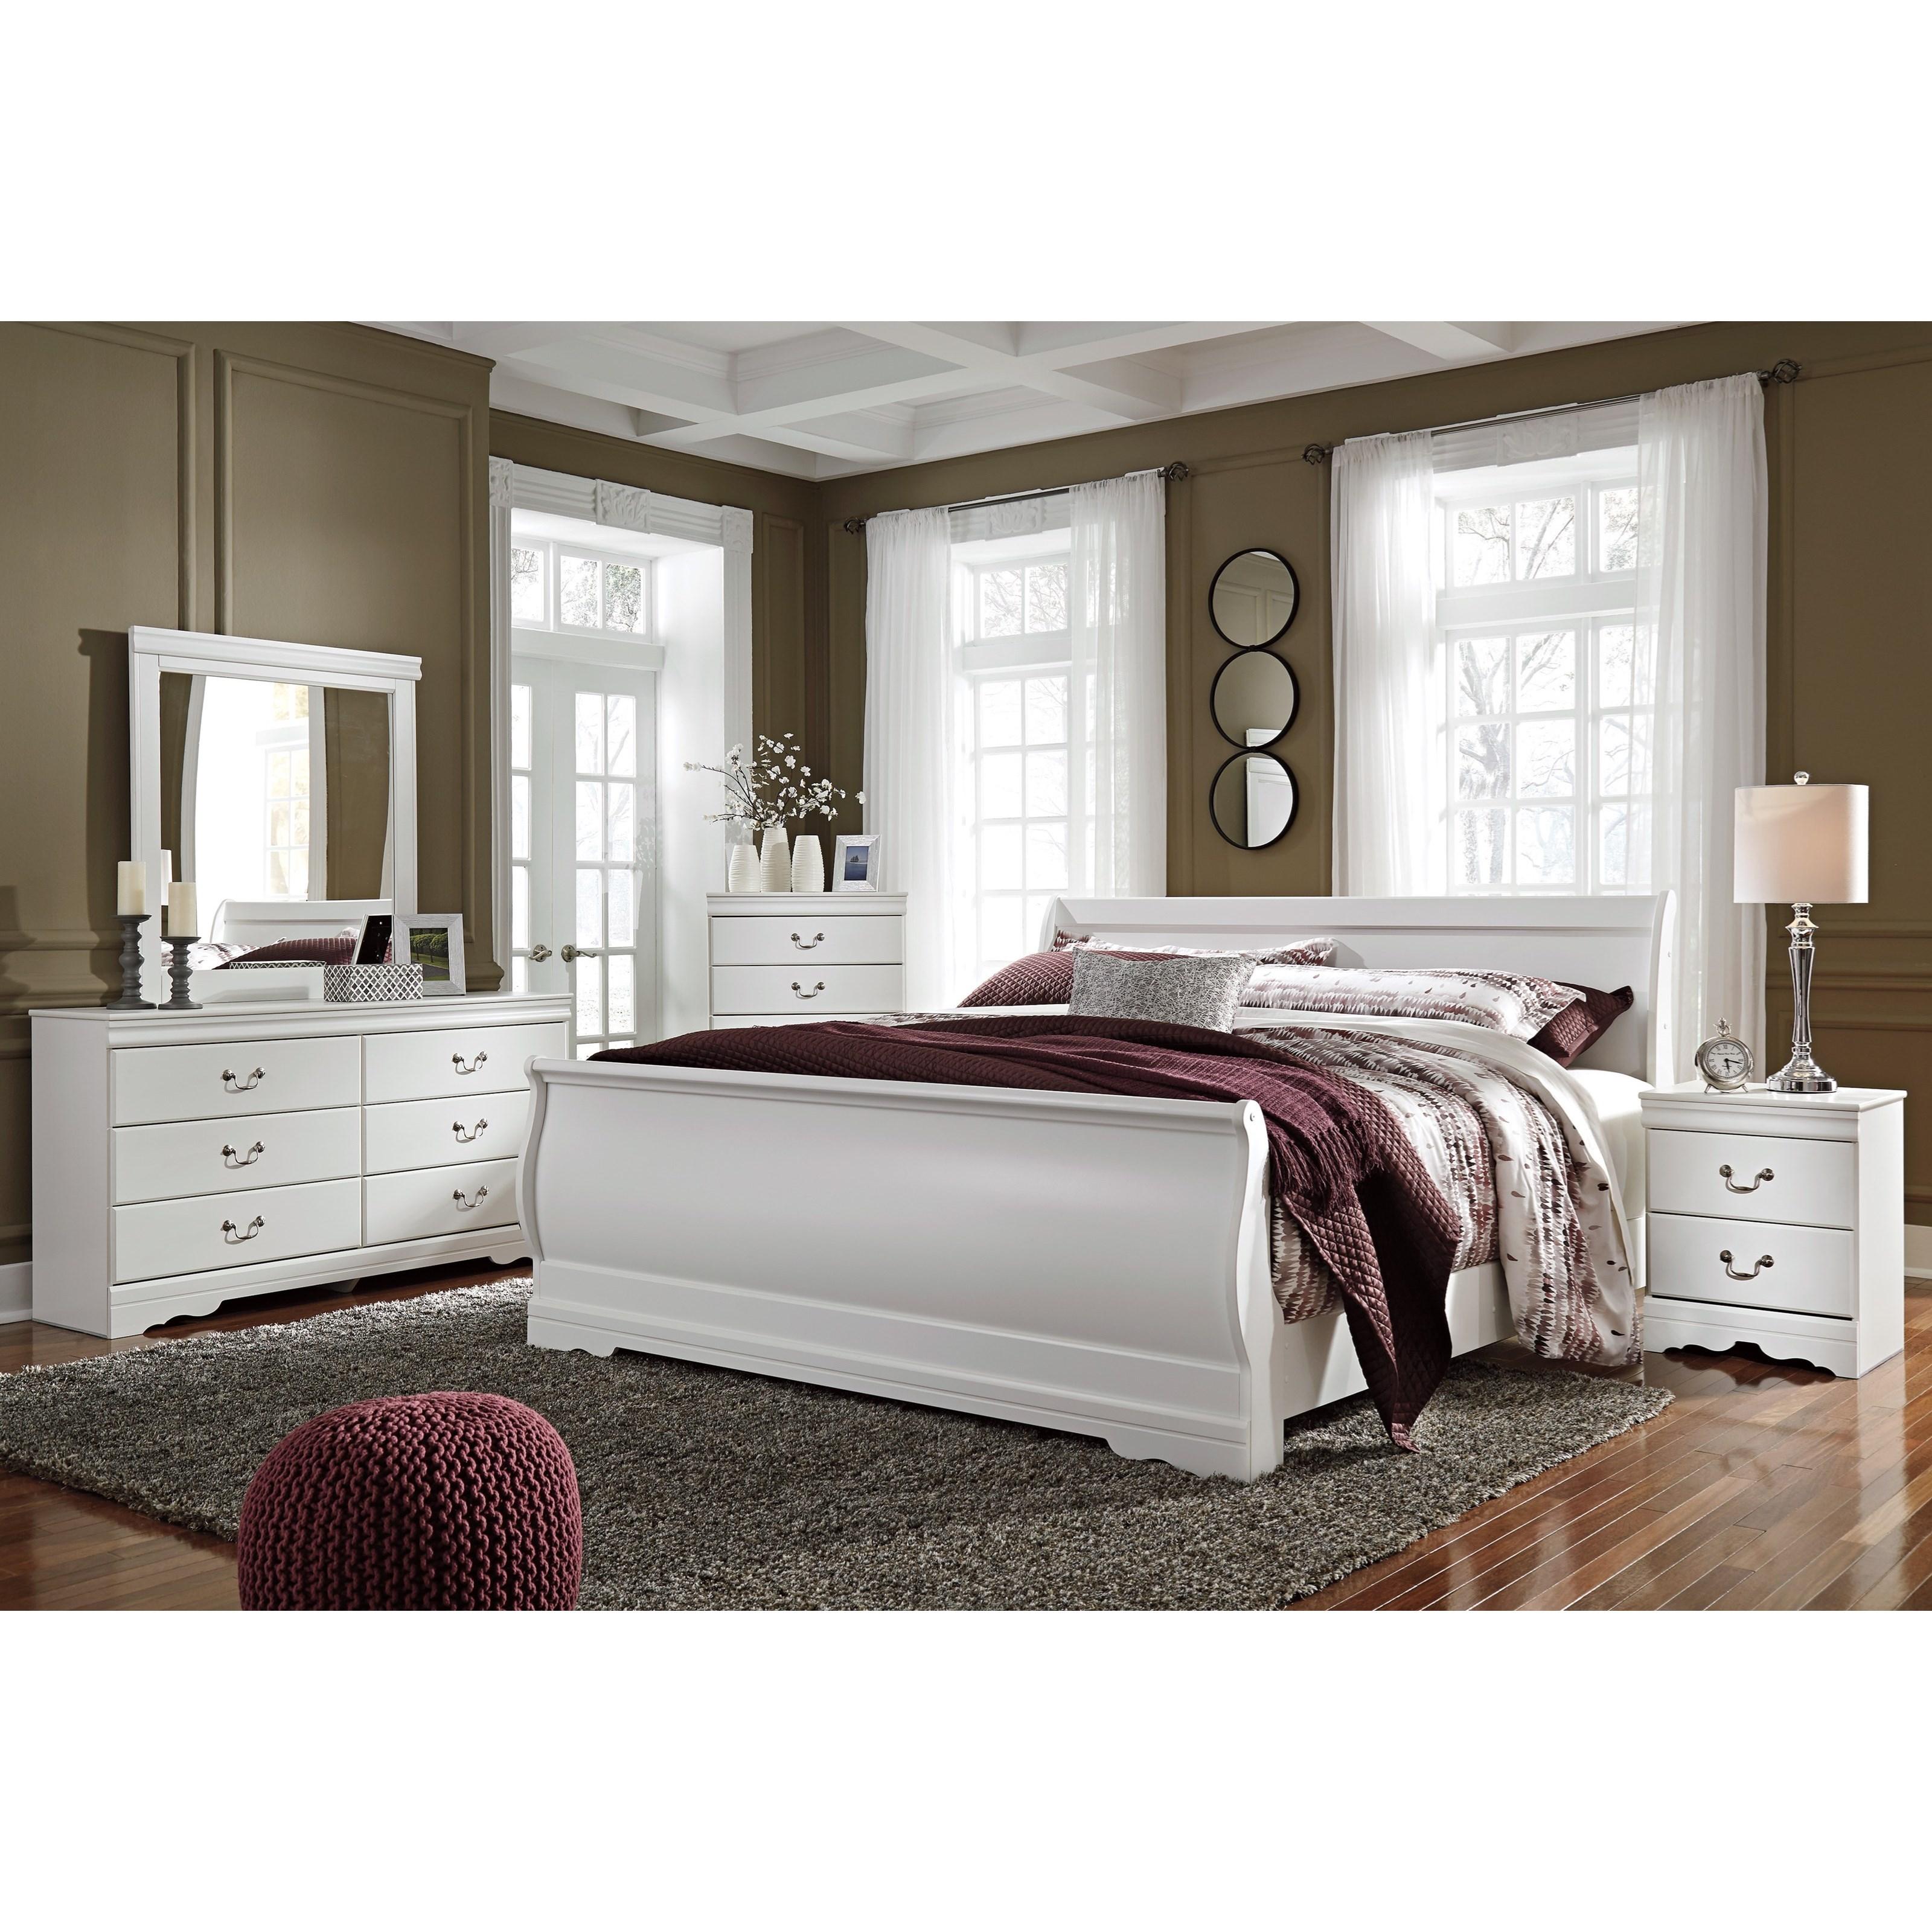 Signature design by ashley anarasia king louis philippe - Ashley furniture sleigh bedroom set ...